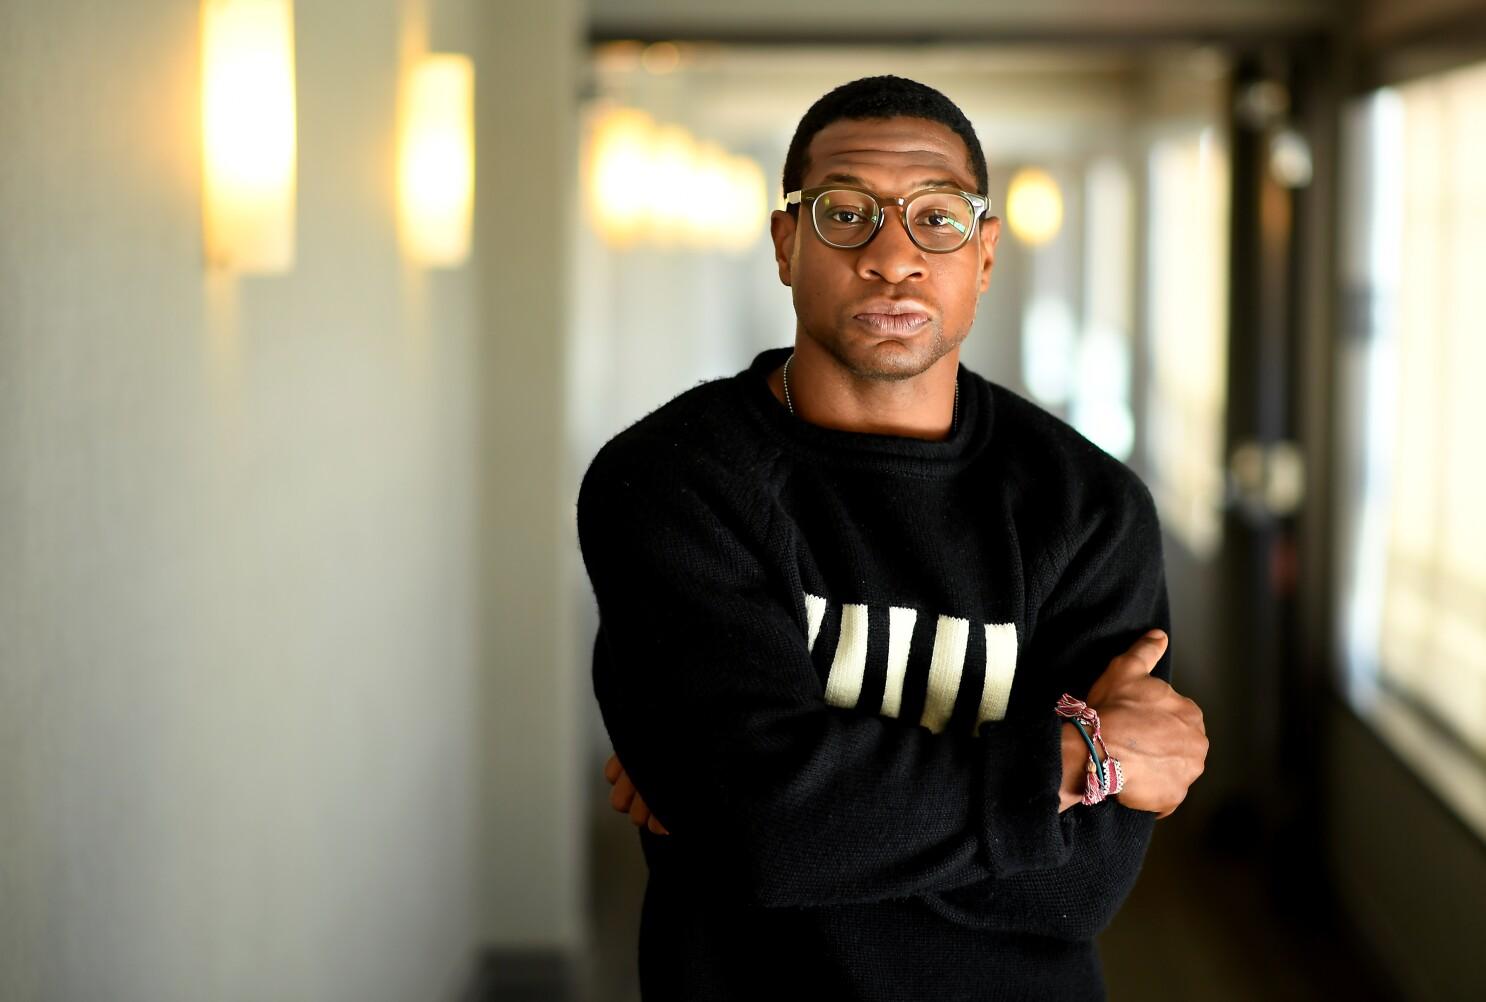 Jonathan Majors finds a unique spirit in 'Last Black Man' - Los Angeles  Times